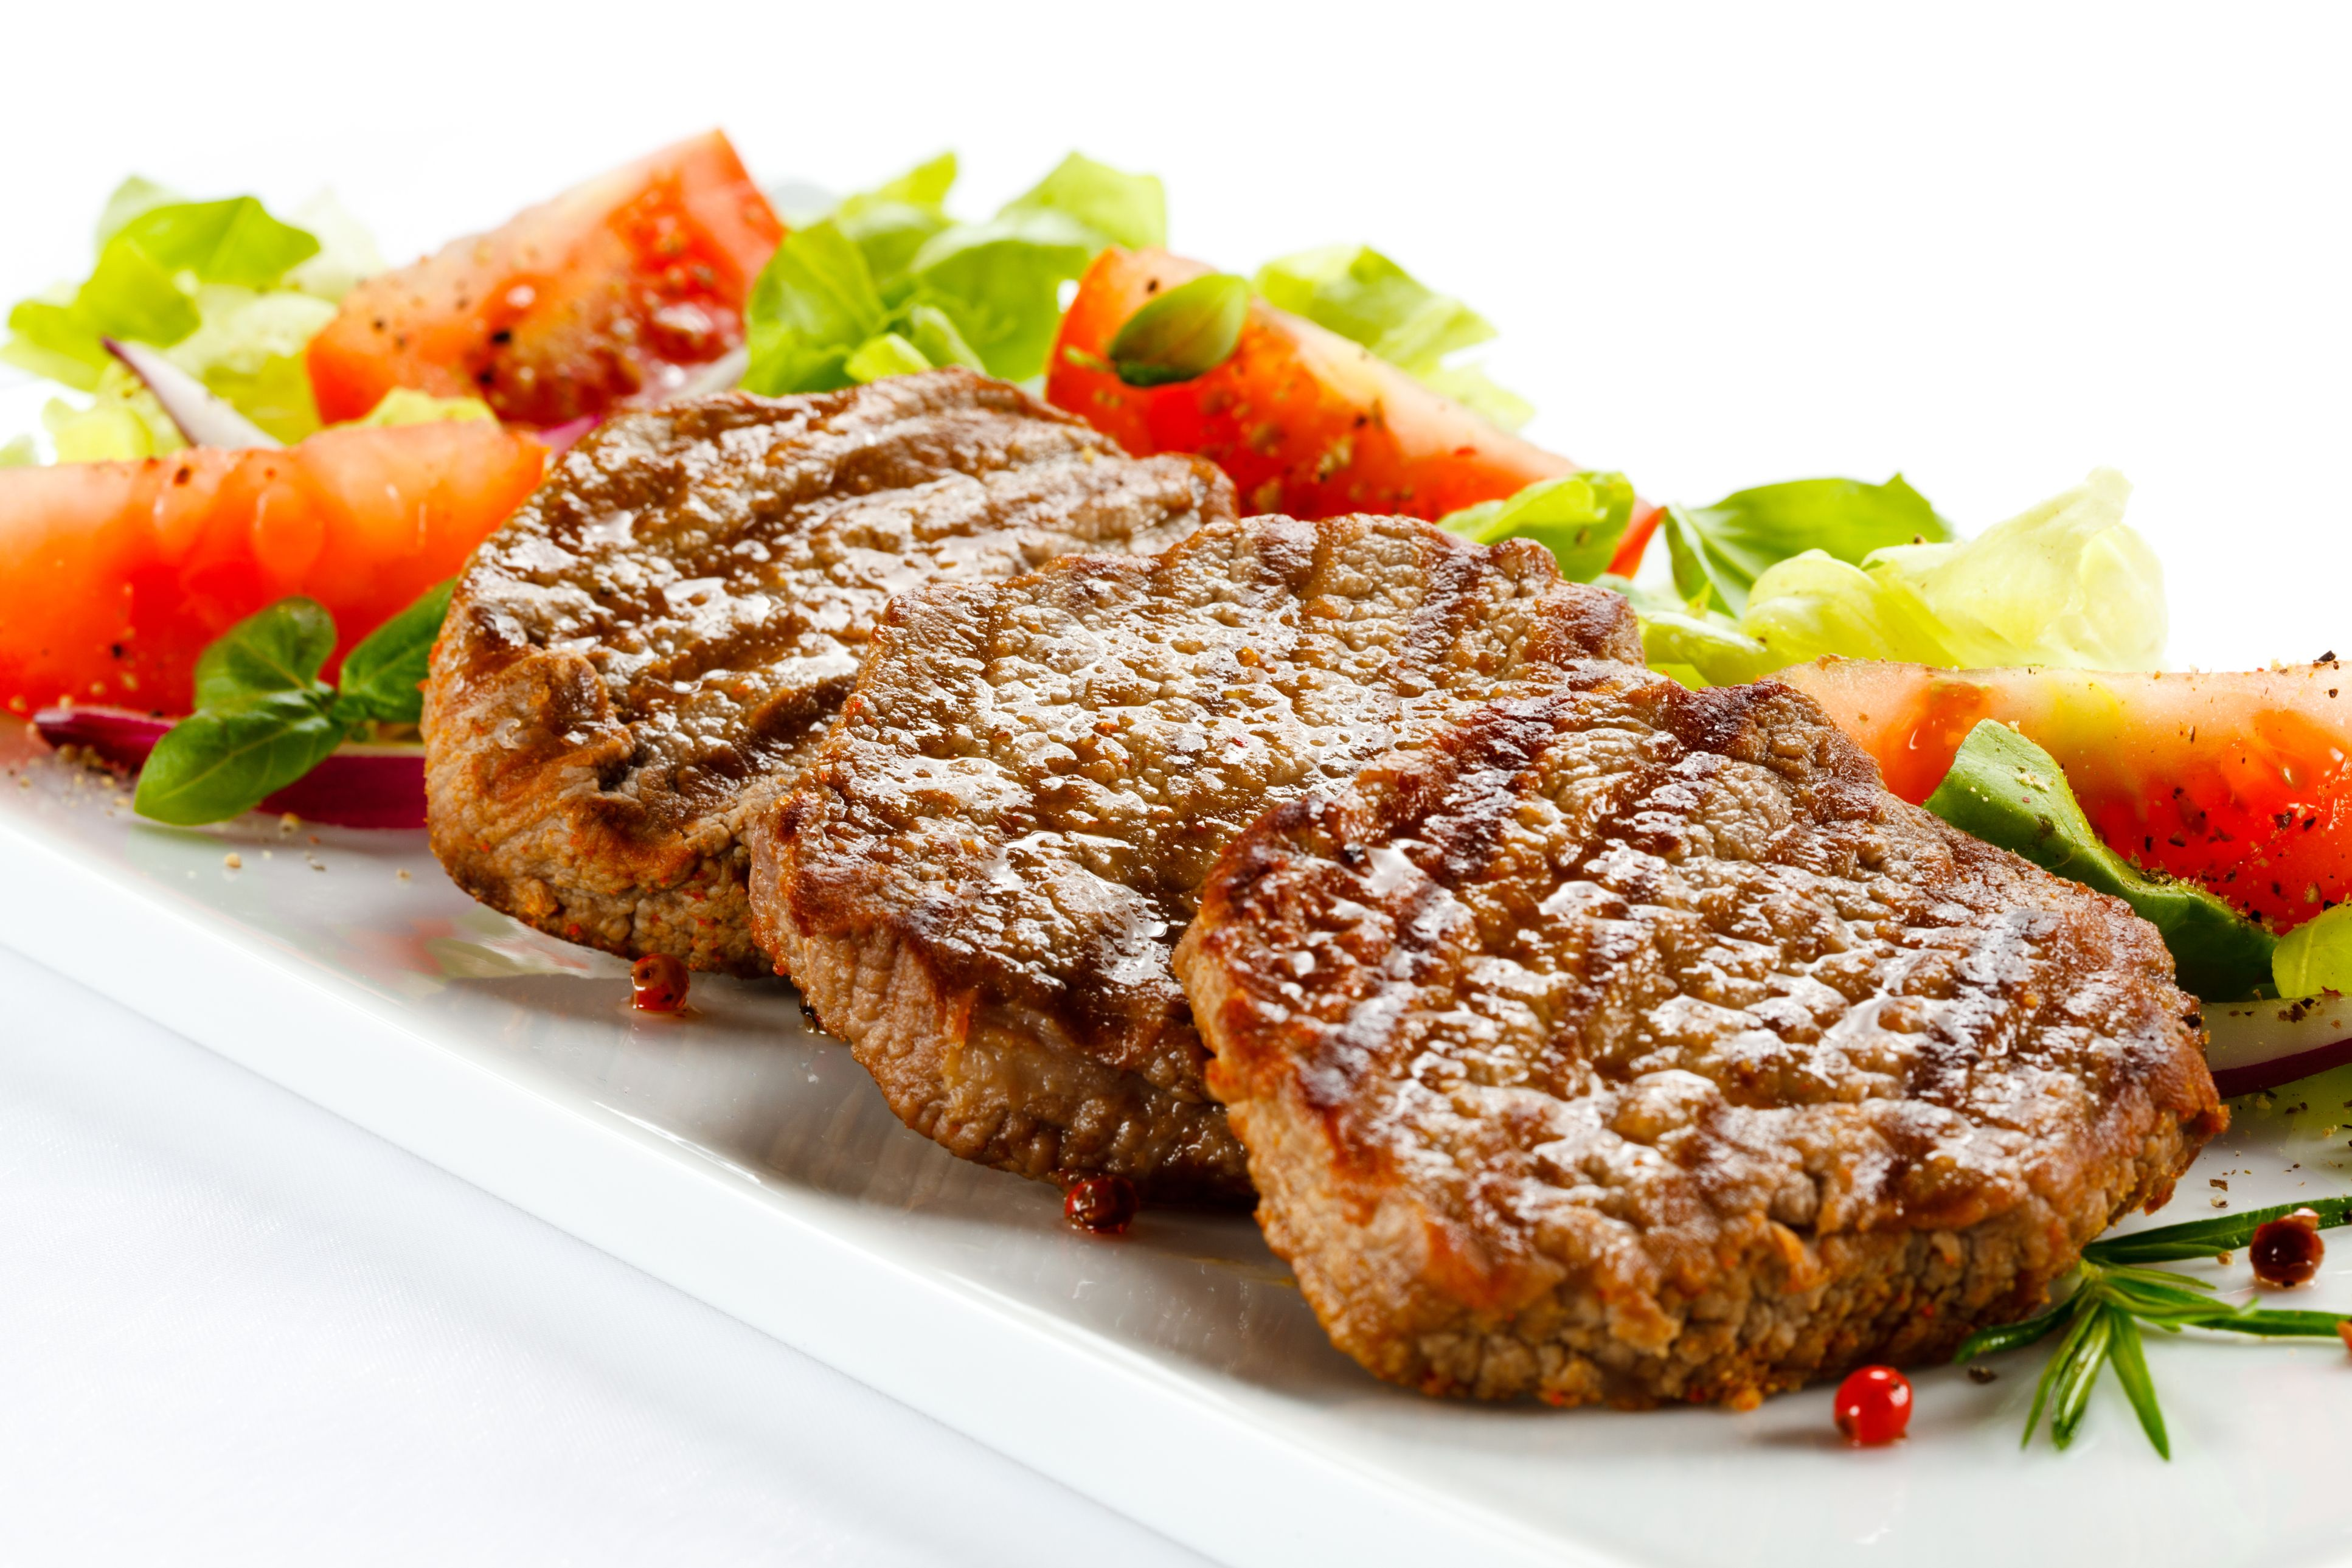 La Dieta de la Prote na